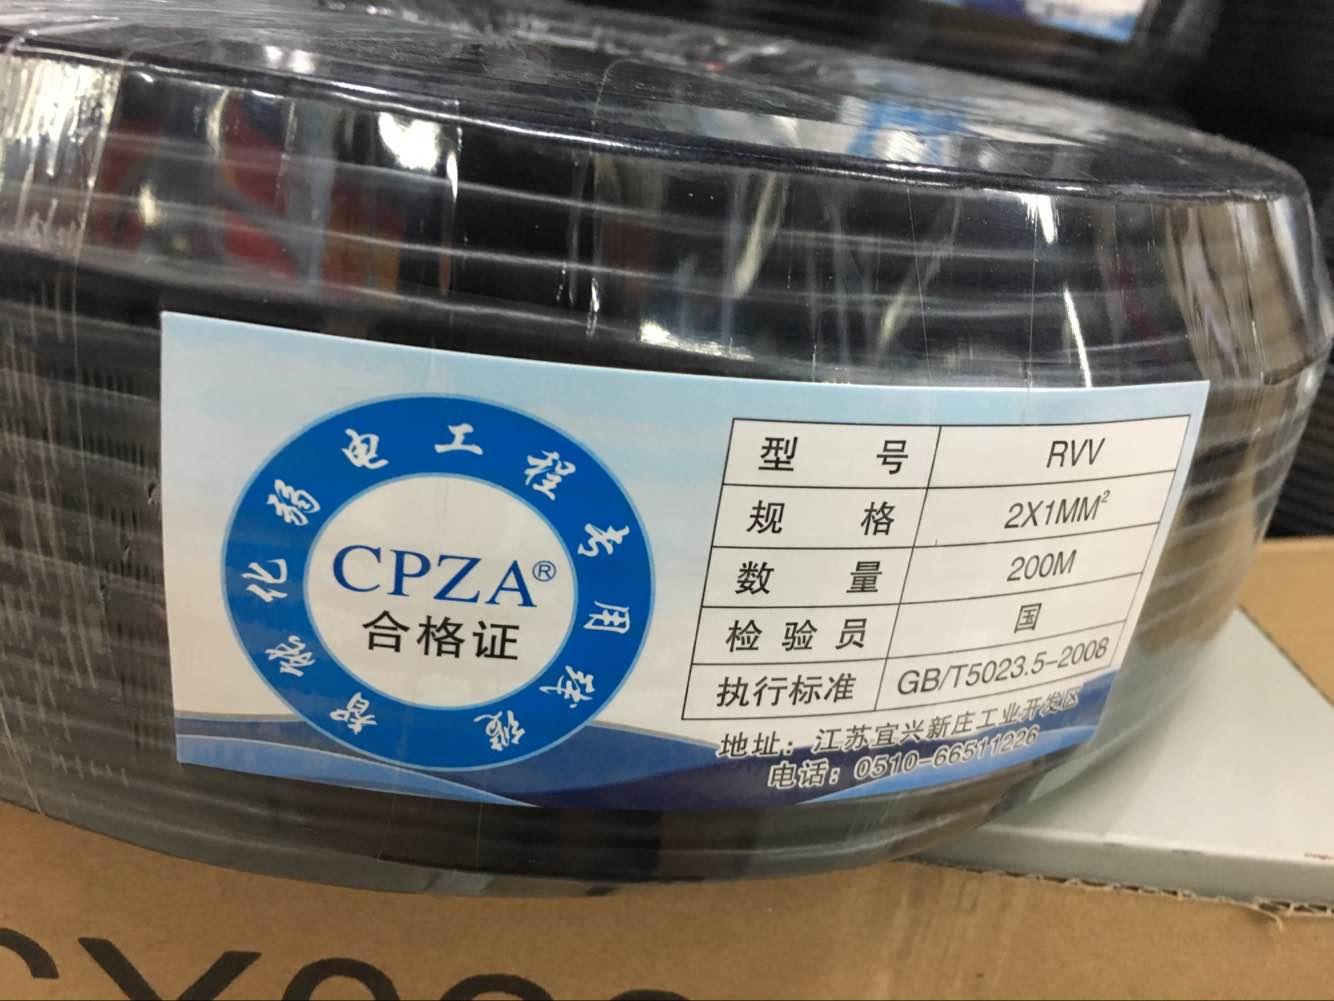 CPZA RVV2*1 国标电源线 监控 报警线缆 监控电源线200/卷